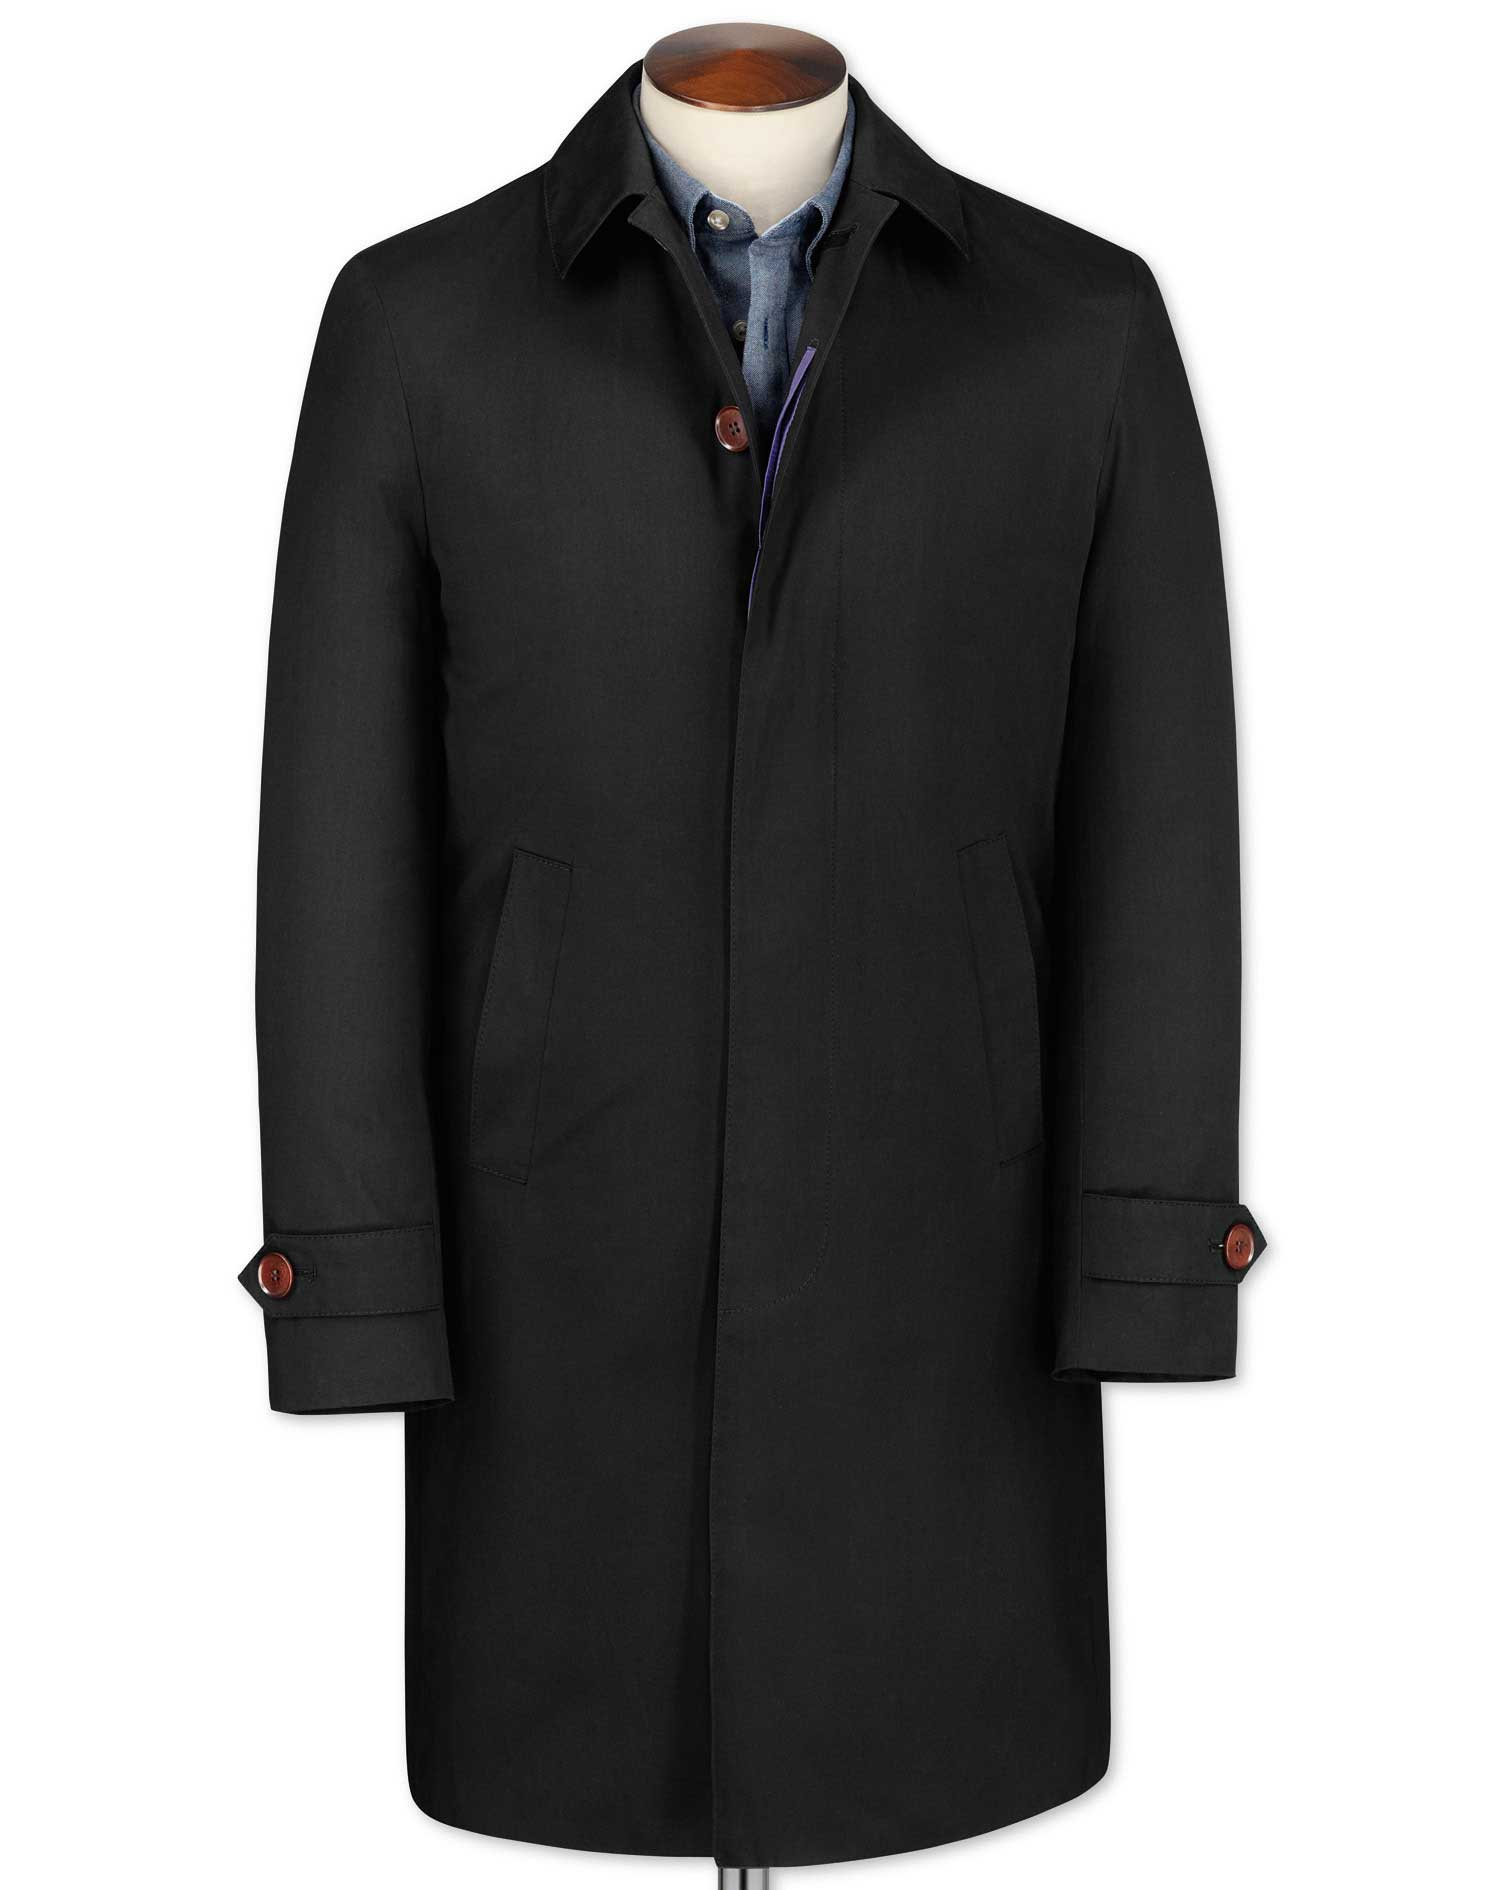 Classic Fit Black RainCotton coat Size 42 Regular by Charles Tyrwhitt